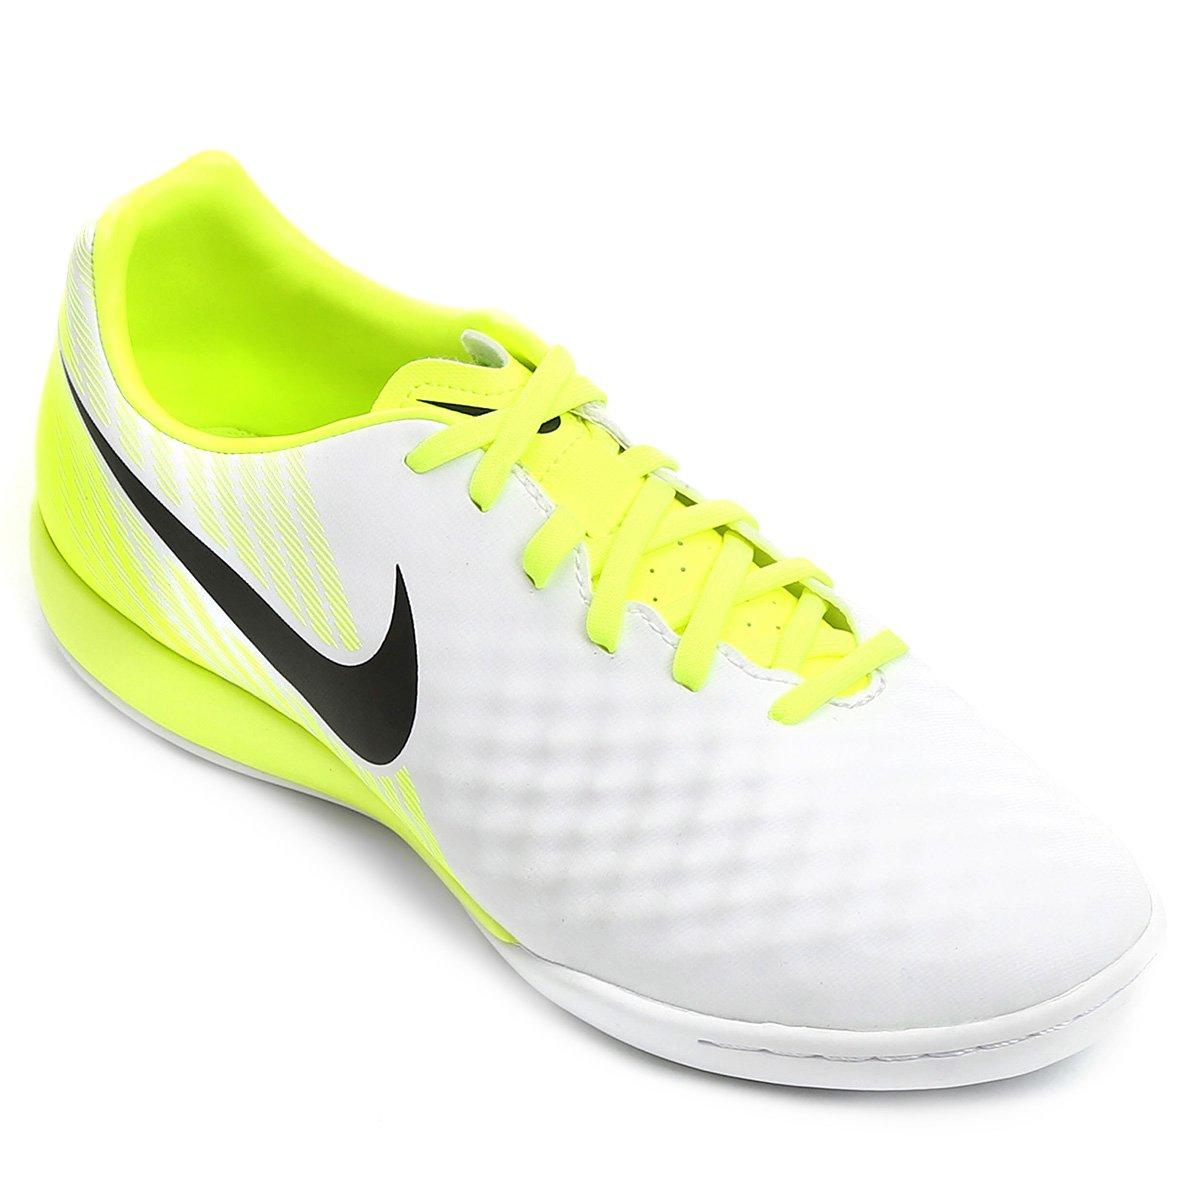 4a75a4af03 Chuteira Futsal Nike Magista Onda II IC Masculina - Compre Agora ...